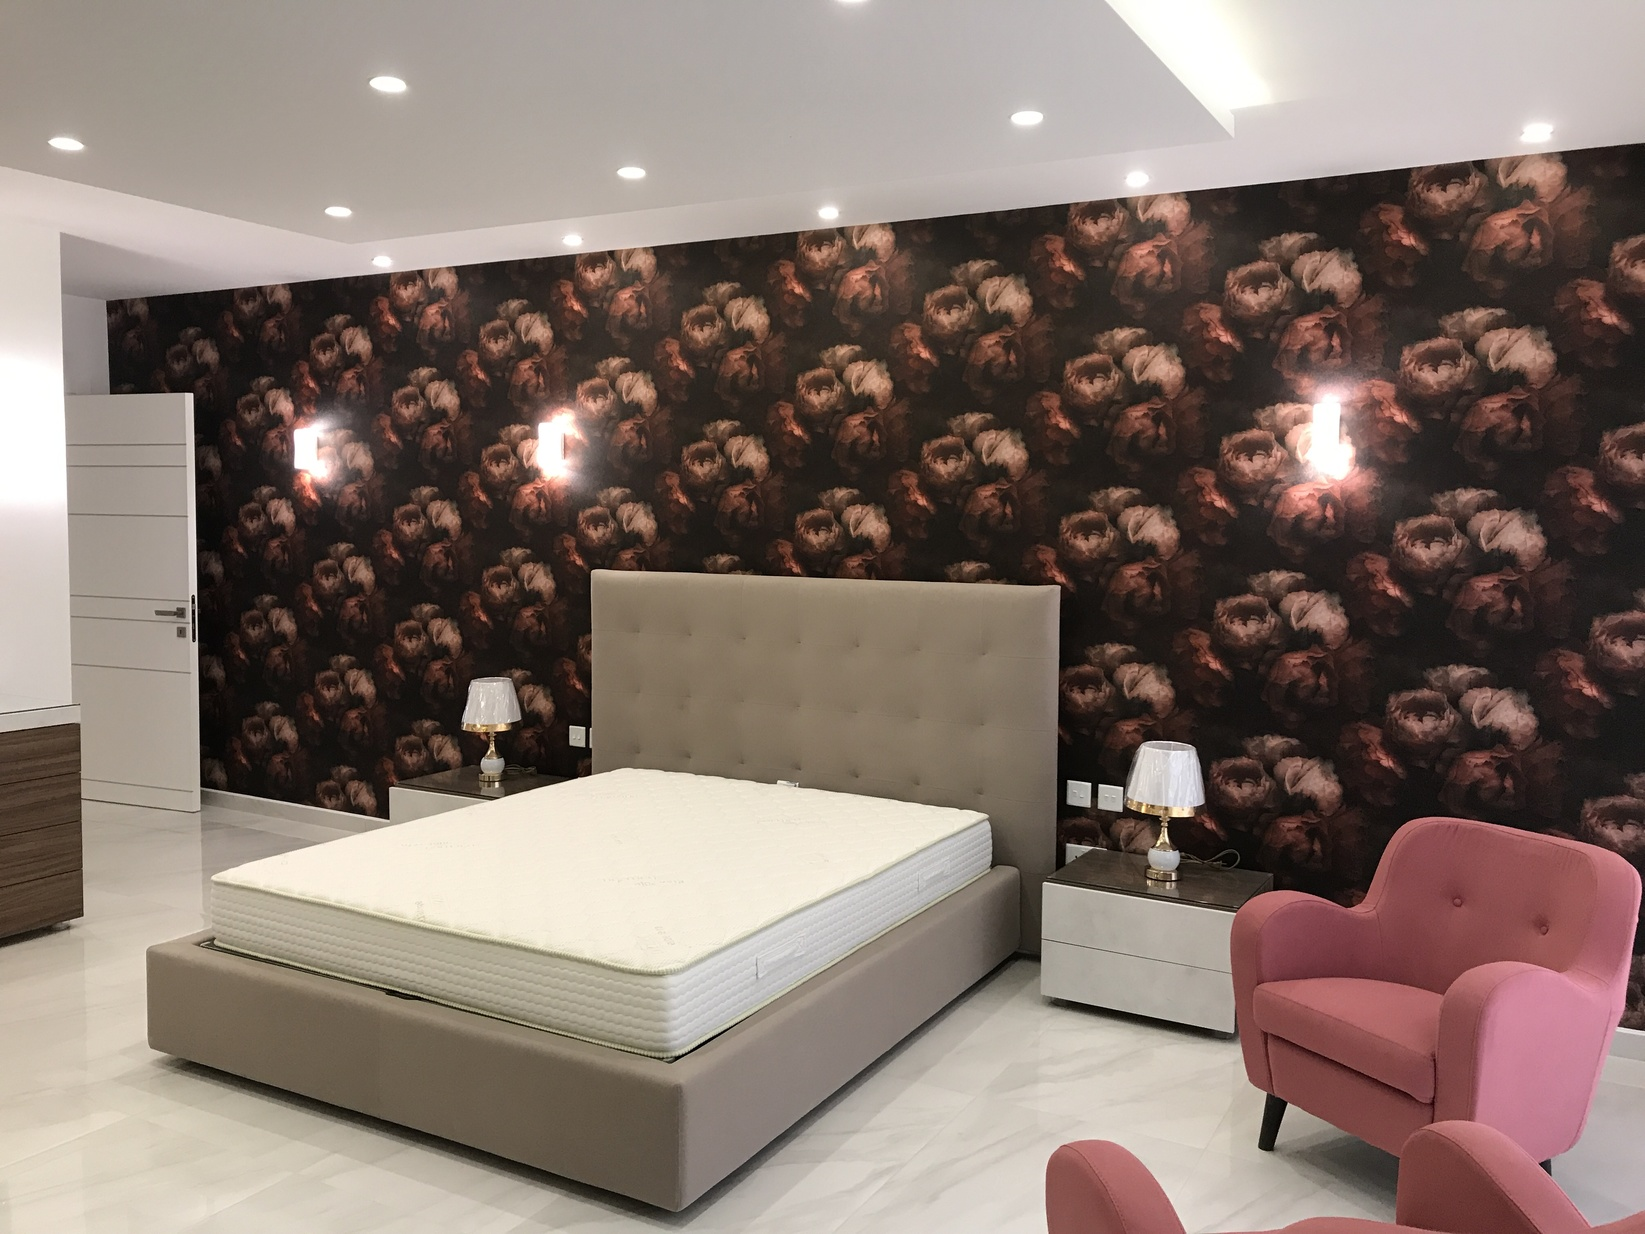 3 bed Apartment For Rent in Qawra, Qawra - thumb 16